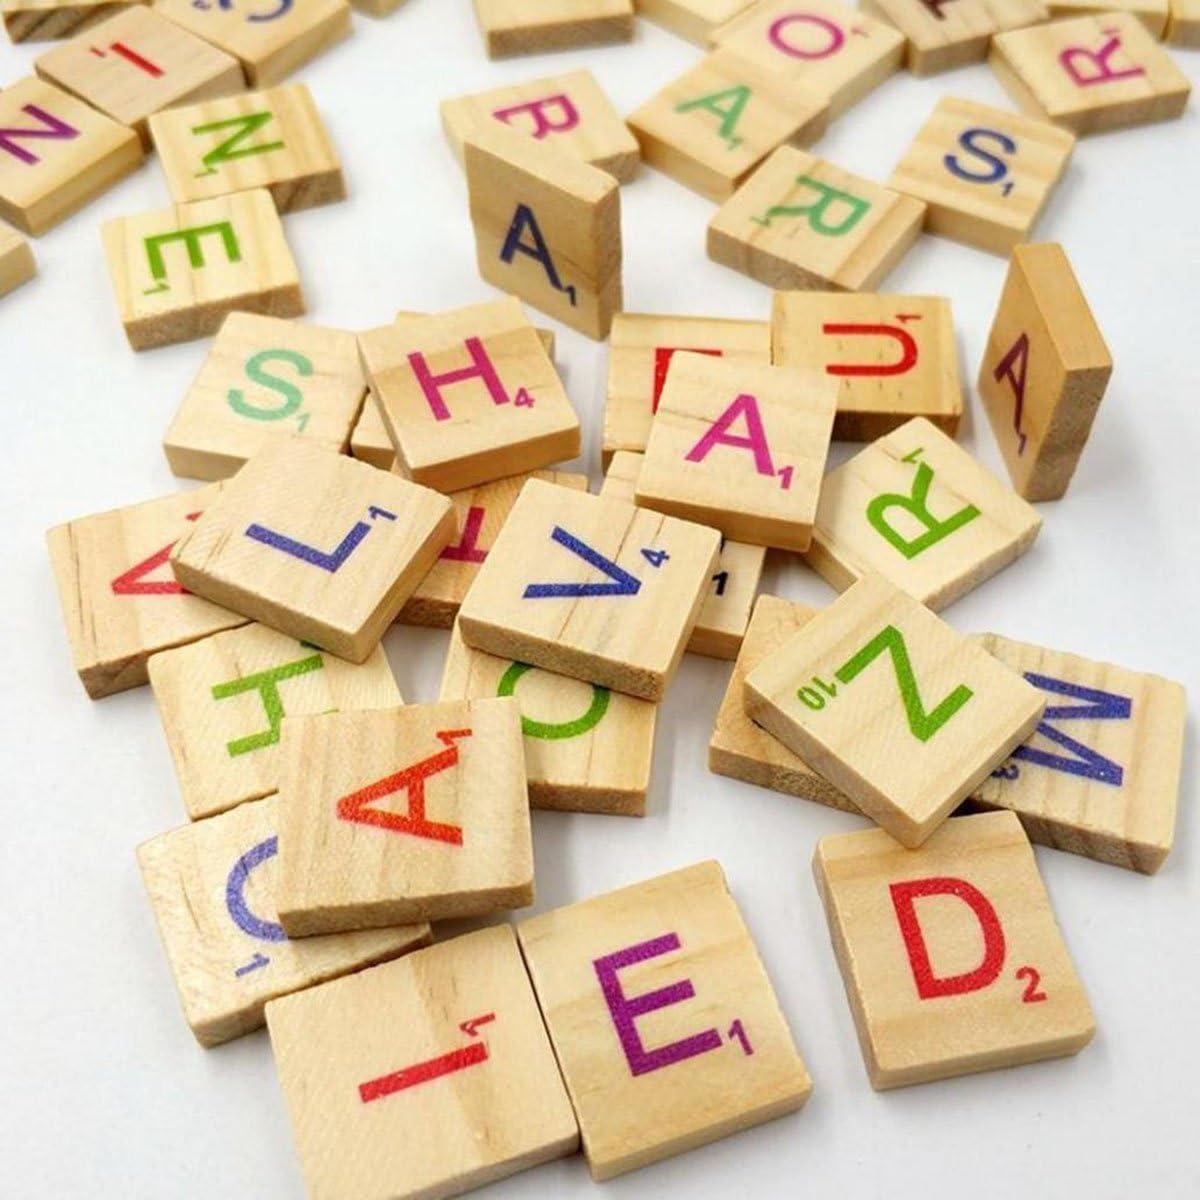 ishua 100 pcs alfabeto Scrabble Ornements carta madera para trabajos manuales Scrabble en madera: Amazon.es: Bebé